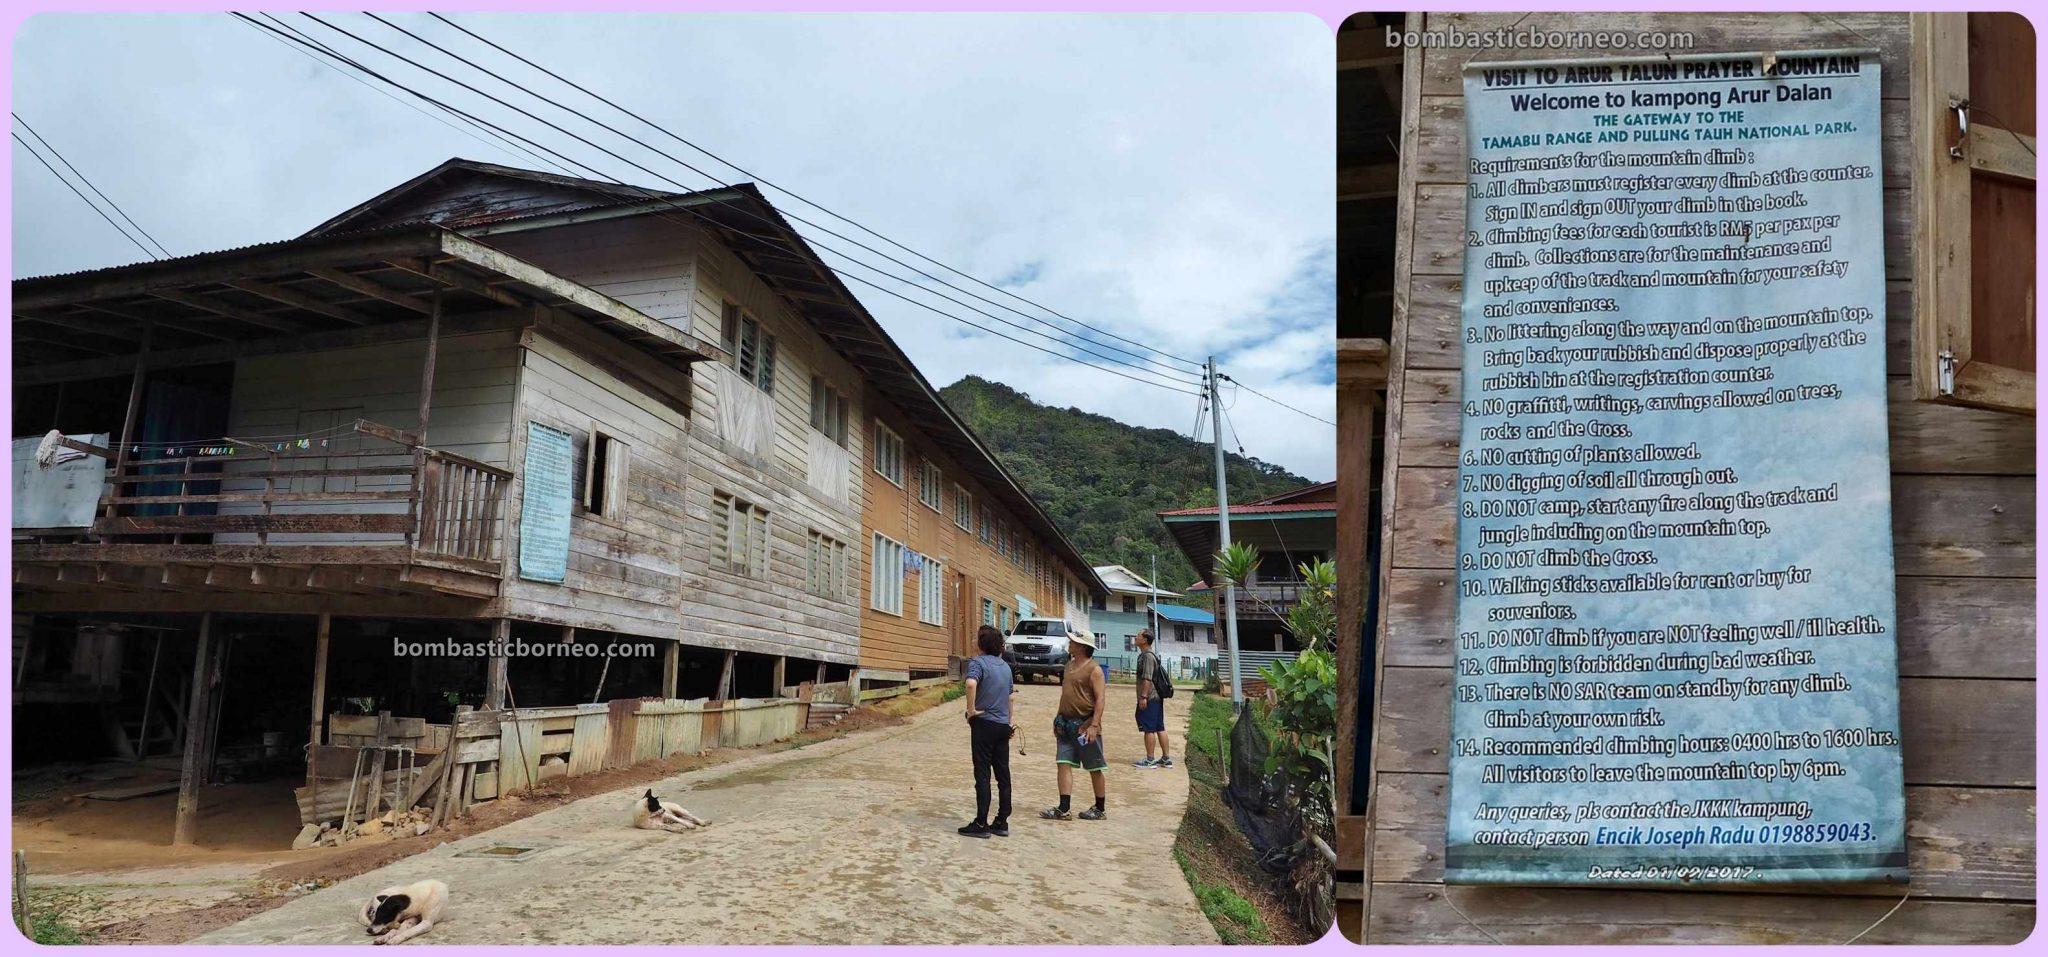 Kelabit Highlands, adventure, nature, outdoor, destination, exploration, homestay, Interior village, Malaysia, Sarawak, Tourism, Trans Borneo, 穿越婆罗洲内陆游踪, 马来西亚砂拉越高原, 巴里奥原住民部落